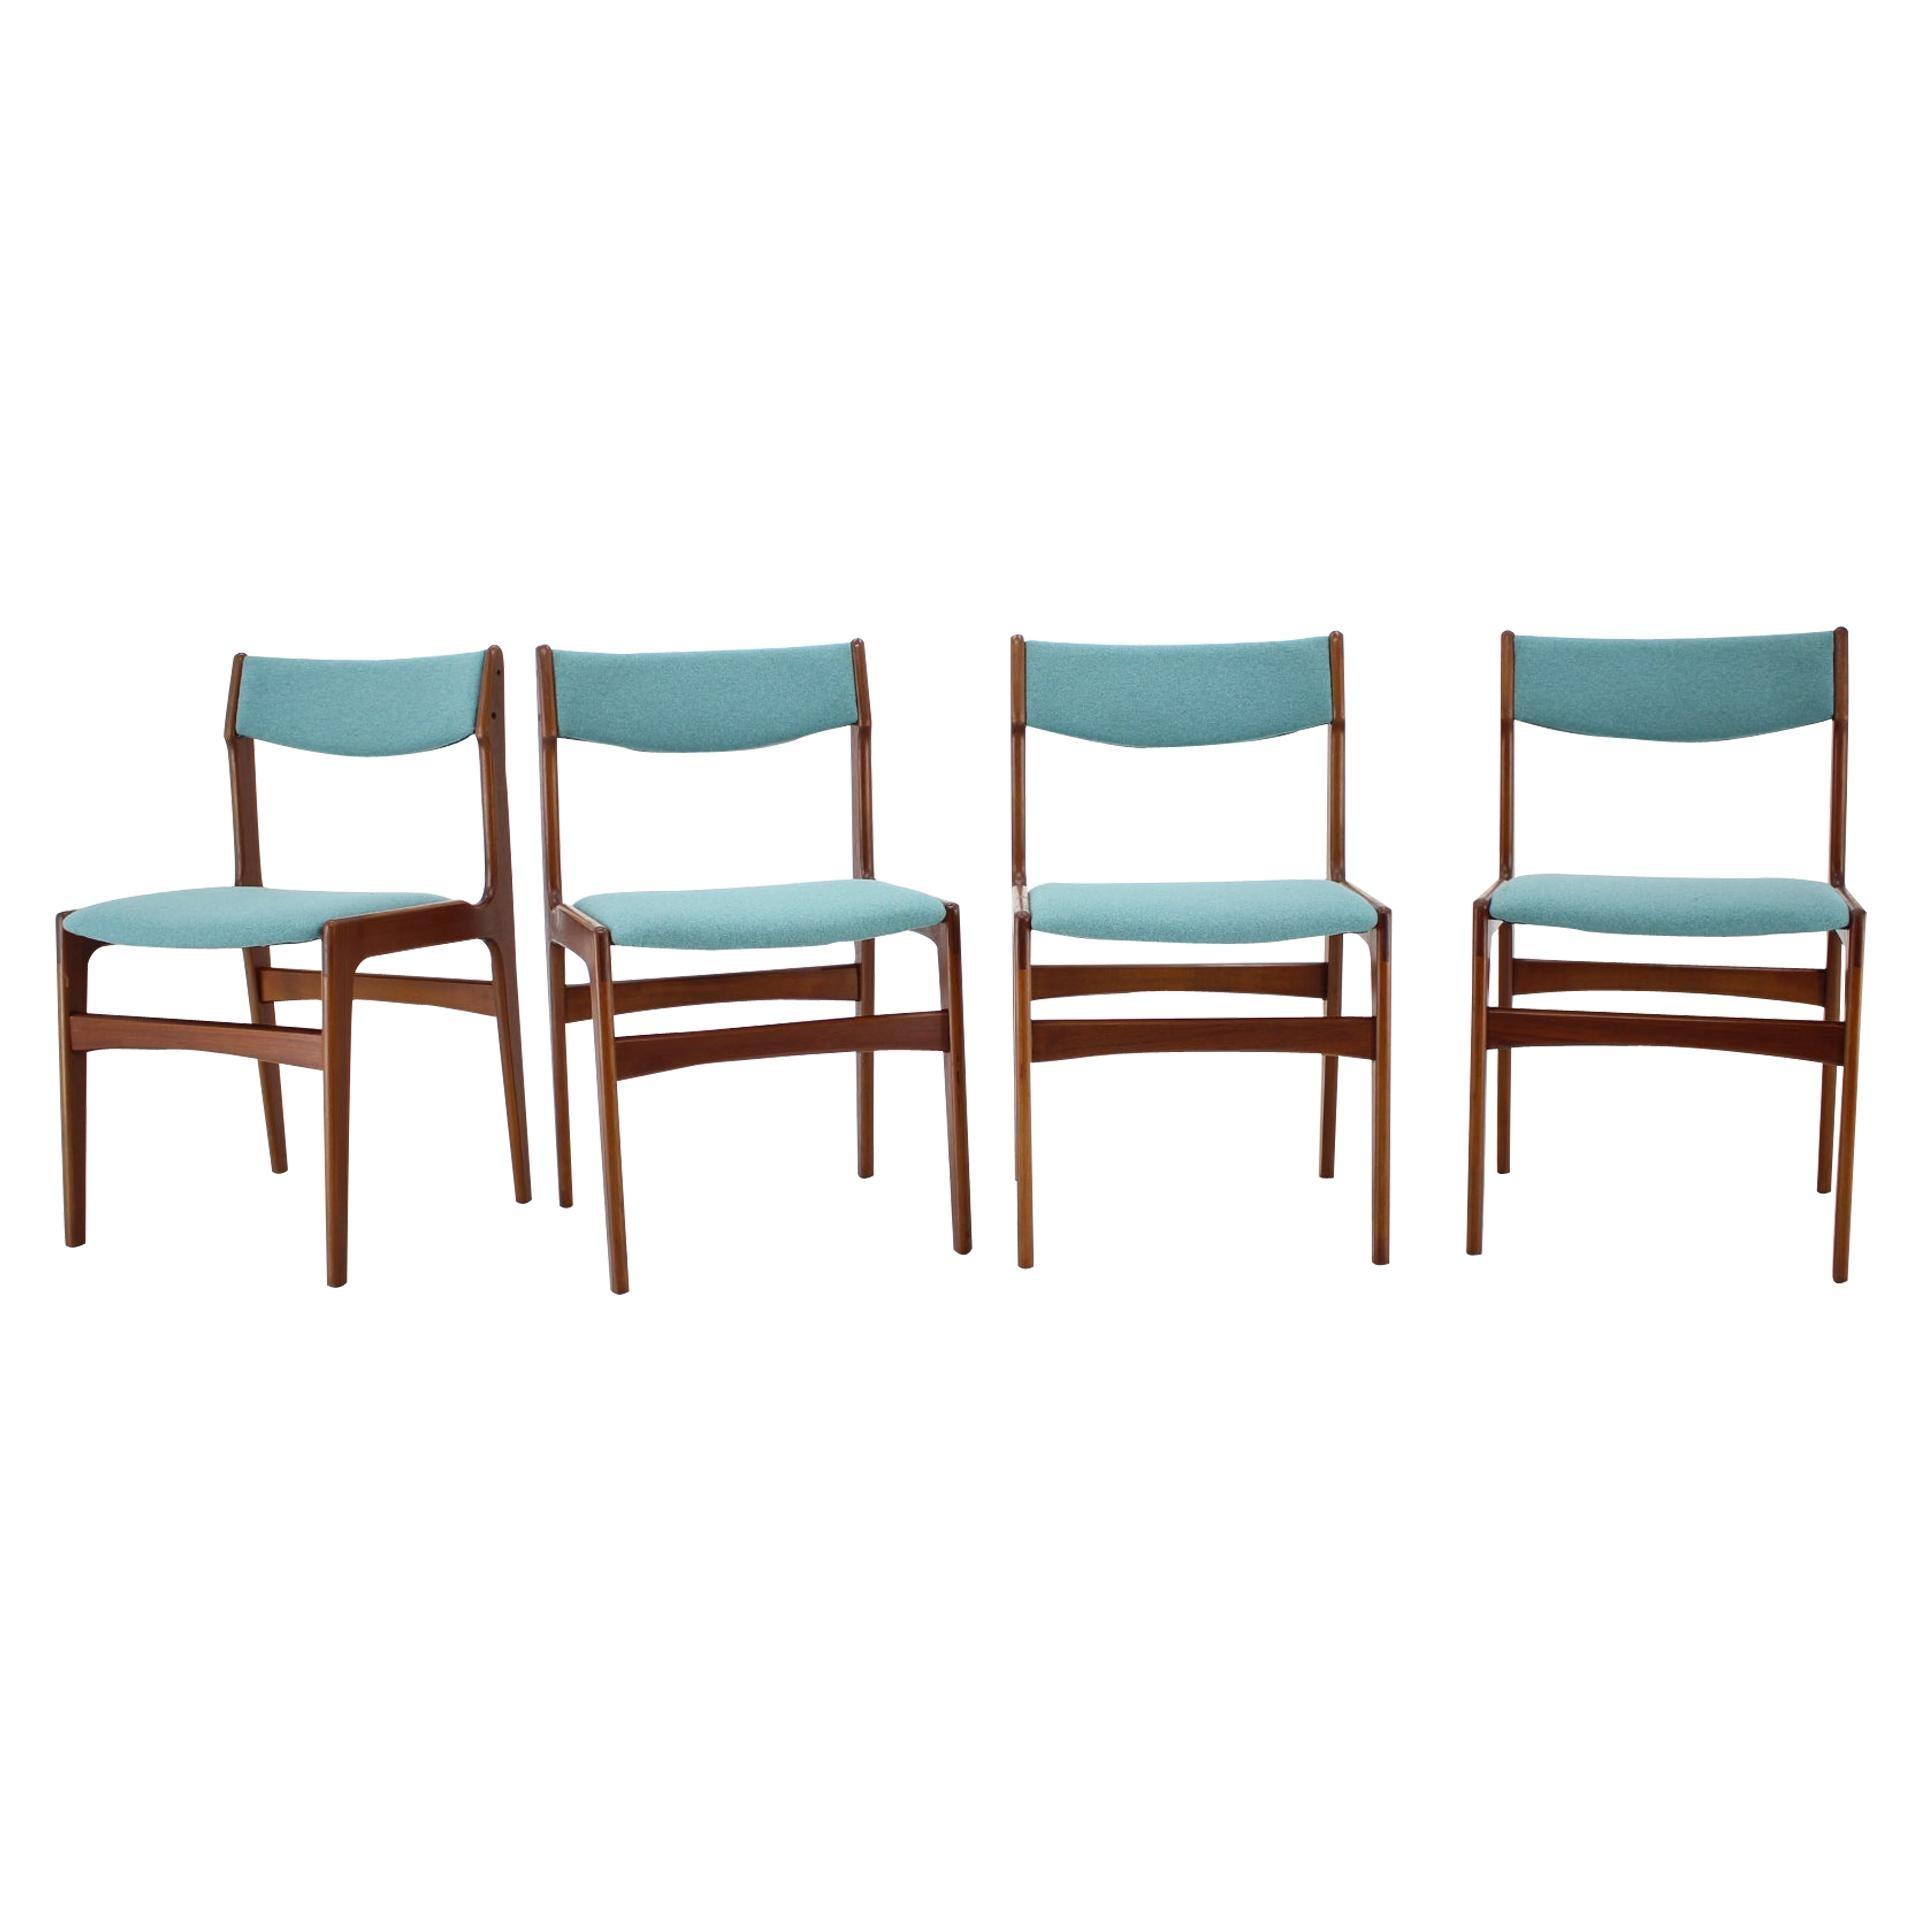 1960s Danish Teak Dining Chairs, Set of 4